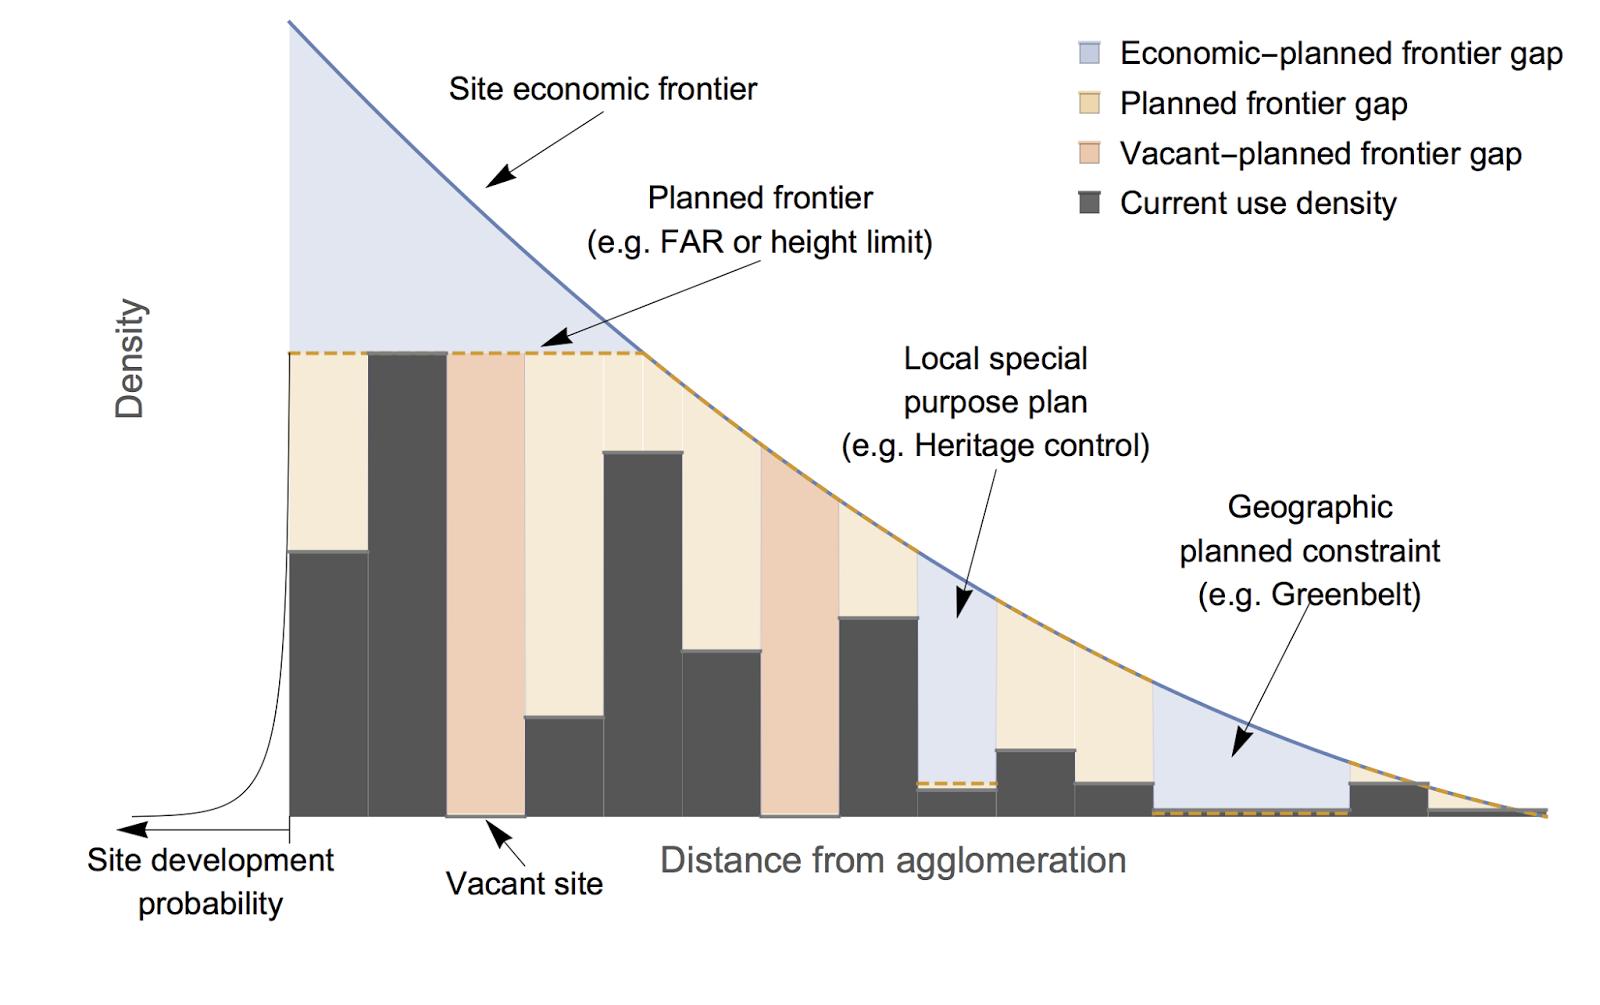 urban economics Urban economics 273 likes course page for psu urban economics class (ec/usp/re 431.